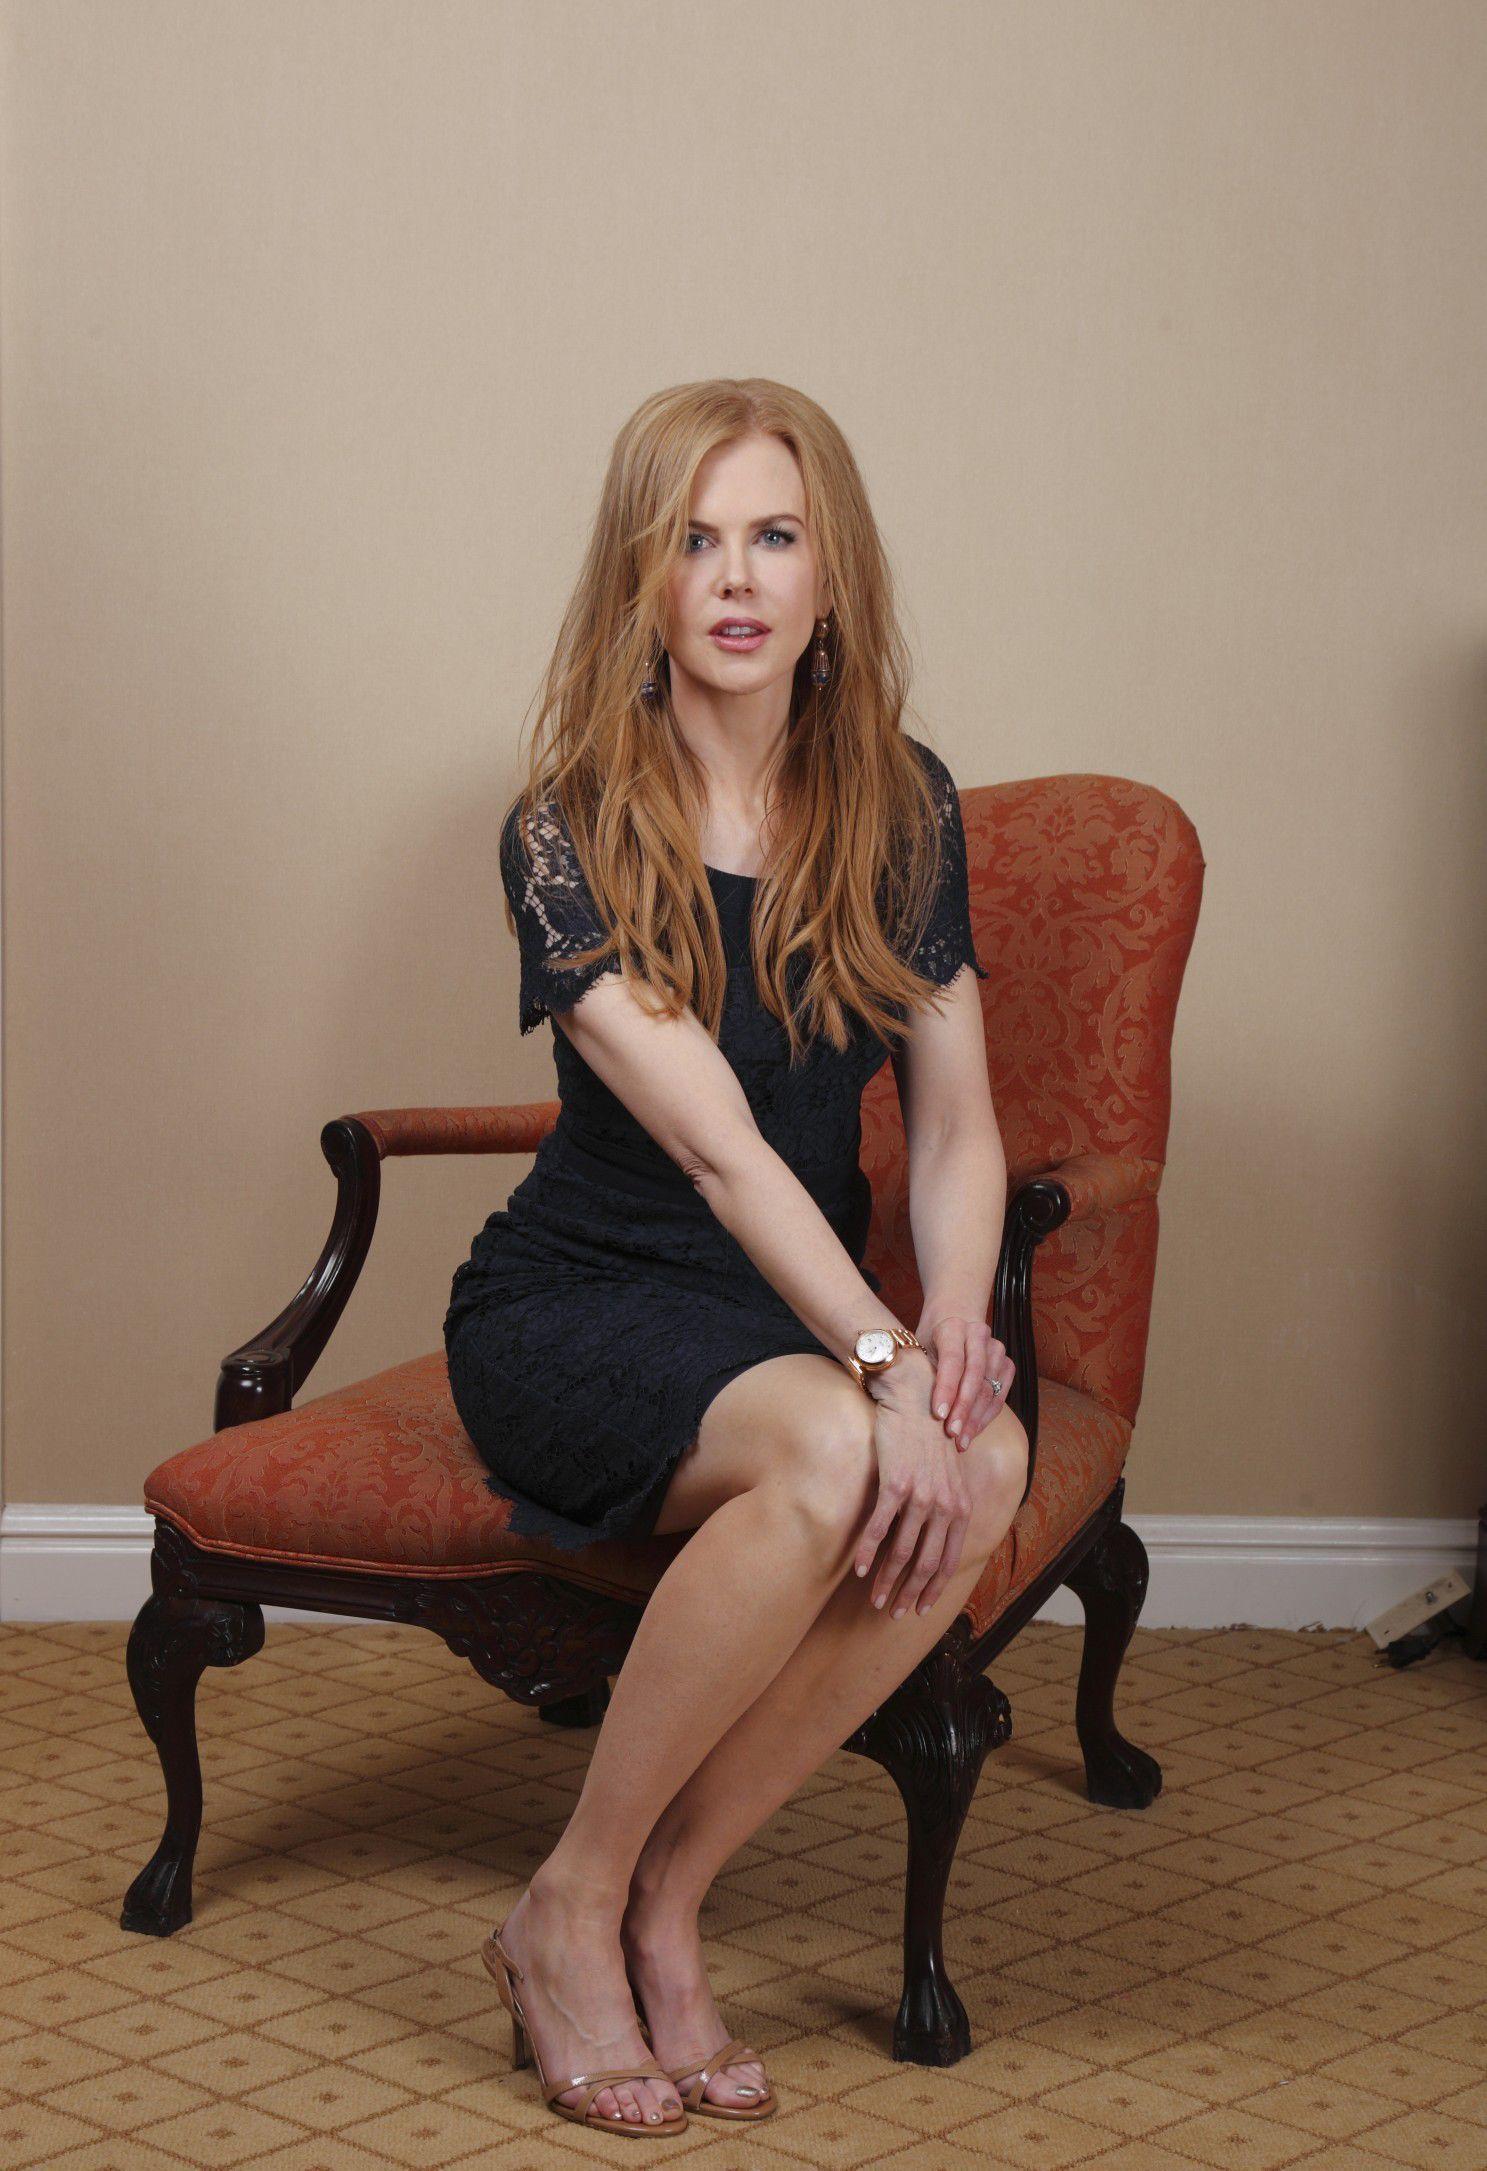 Feet Nicole Kidman nude photos 2019